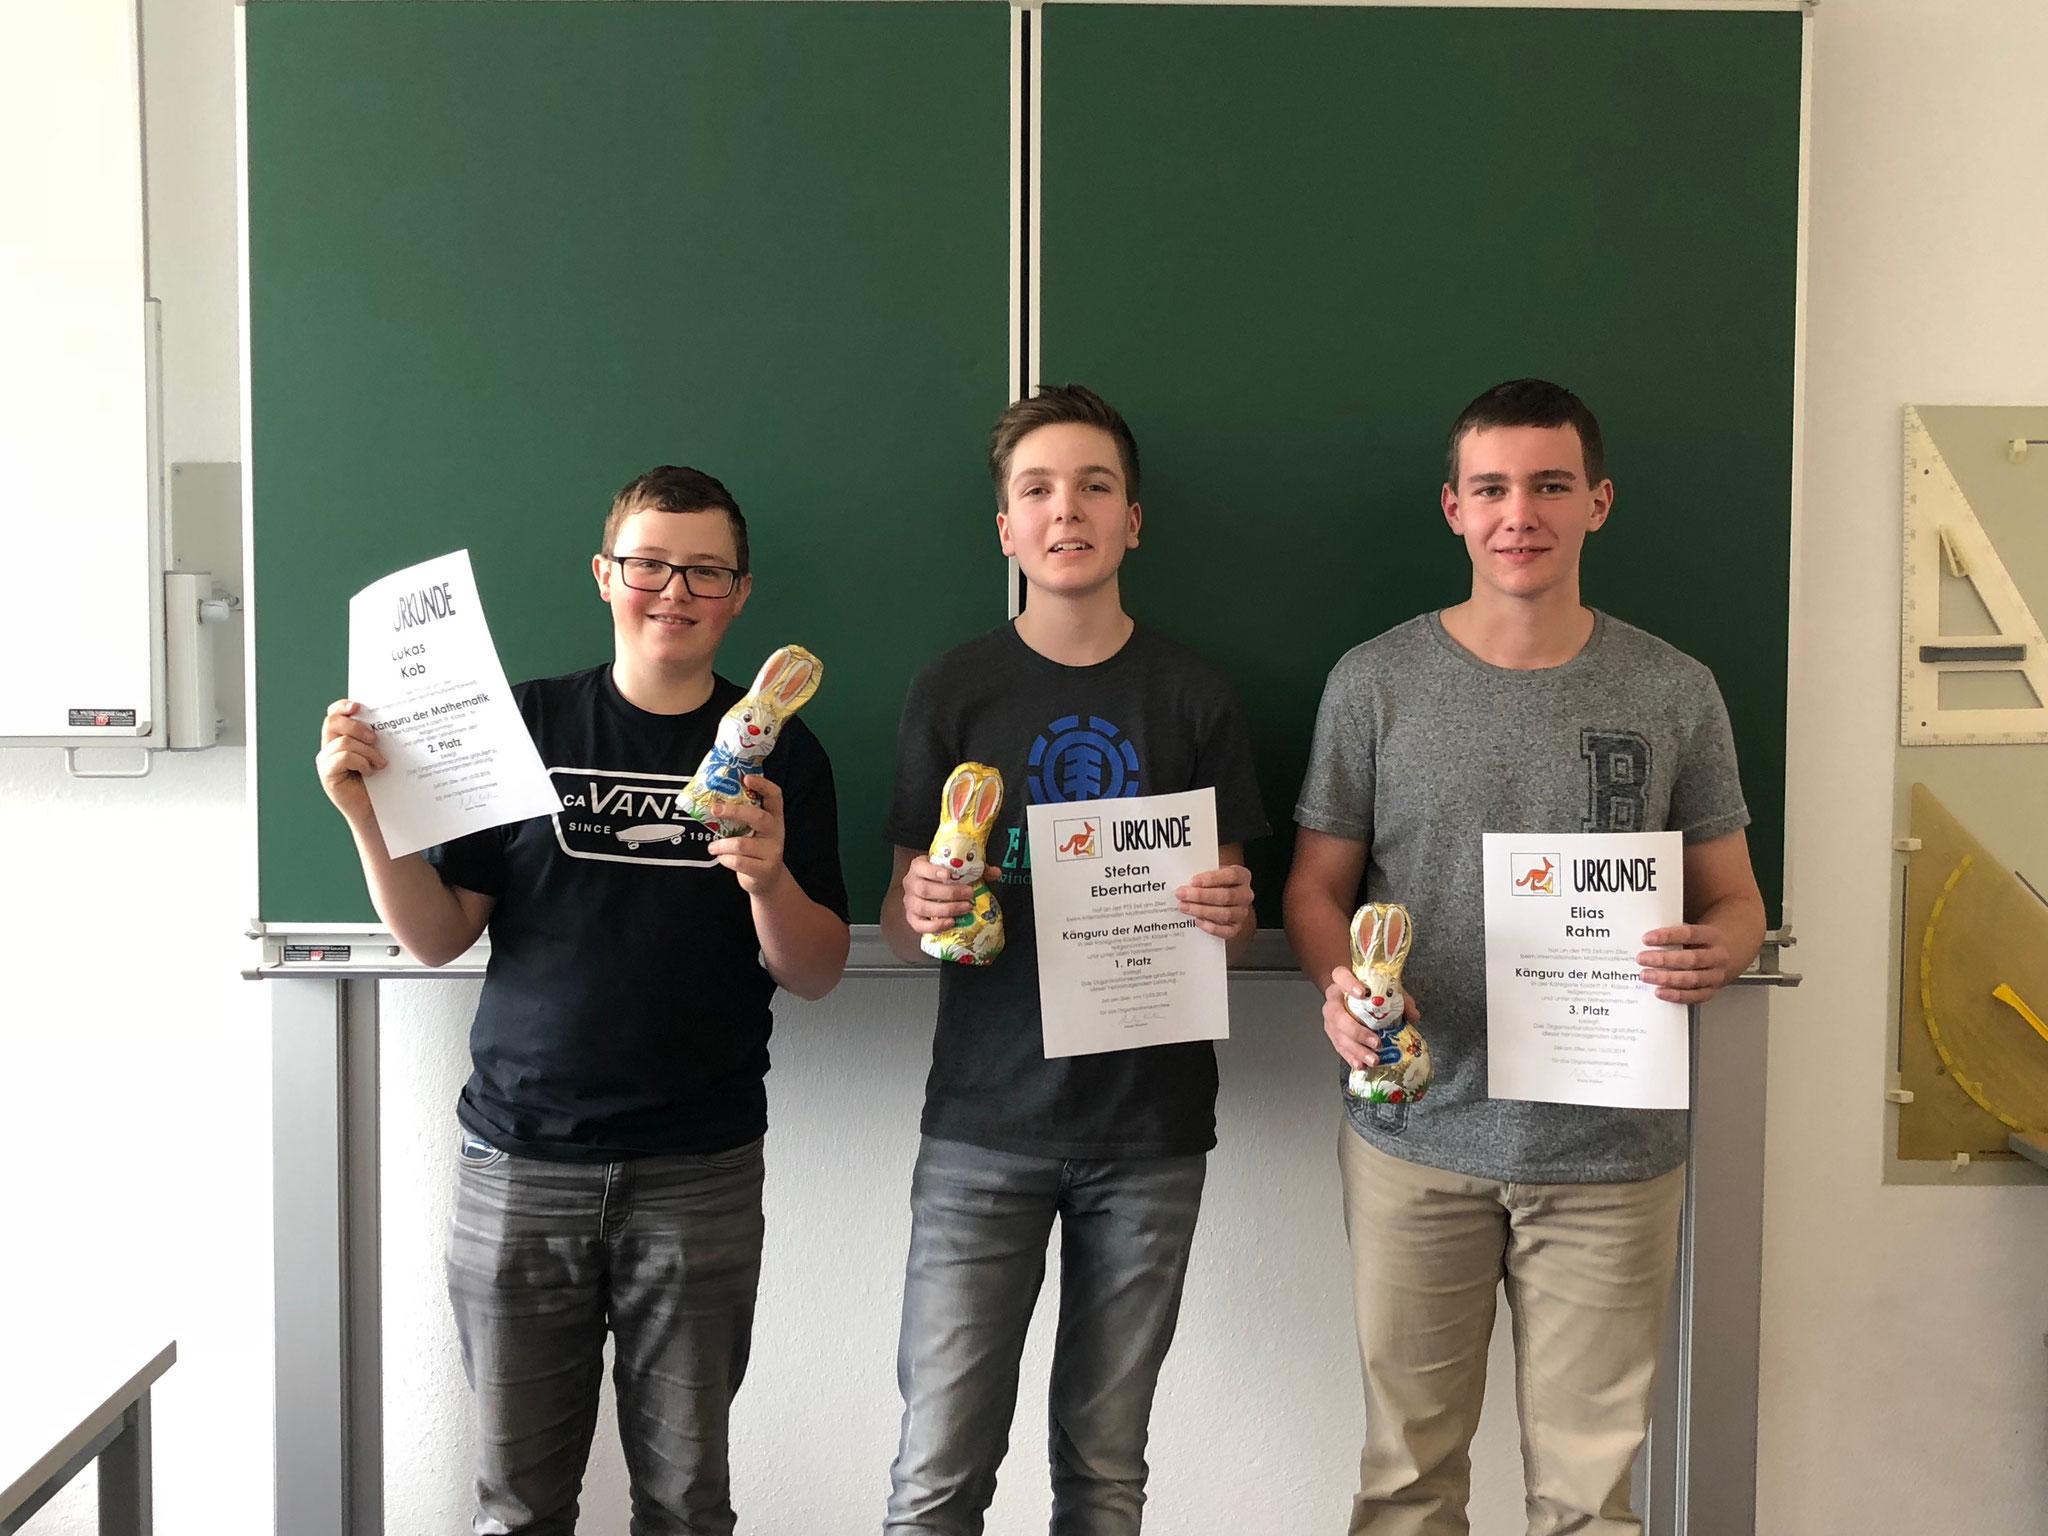 Sieger Gruppe 1: Lukas Kob (Platz 2), Stefan Eberharter (Platz 1), Elias Rahm (Platz 3)